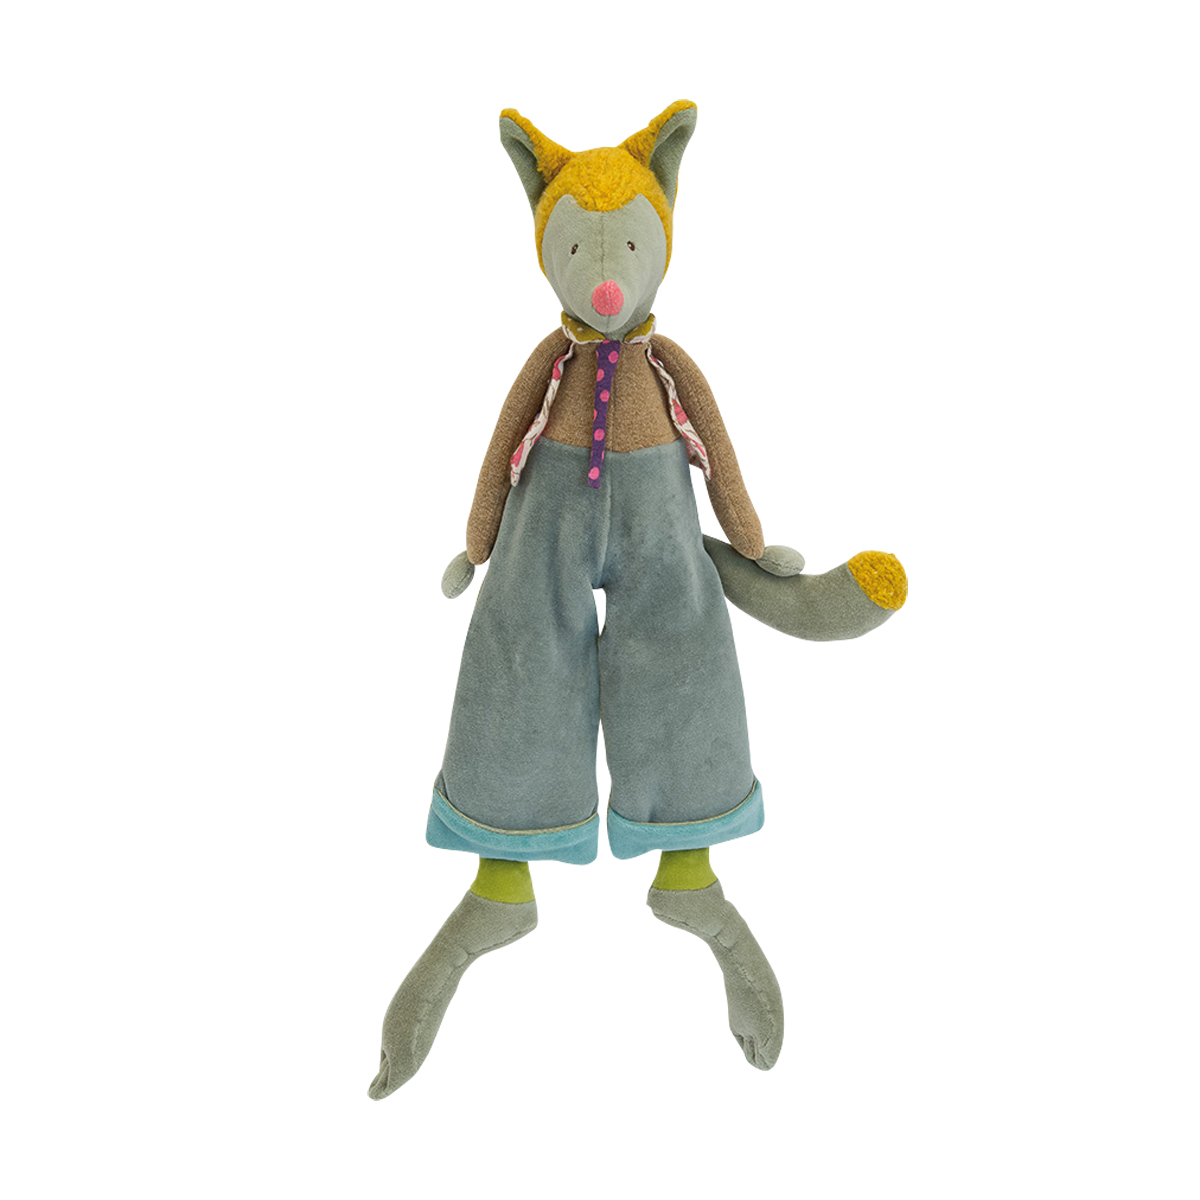 「Les Tartempois」抱き人形・オオカミのルゥルゥ